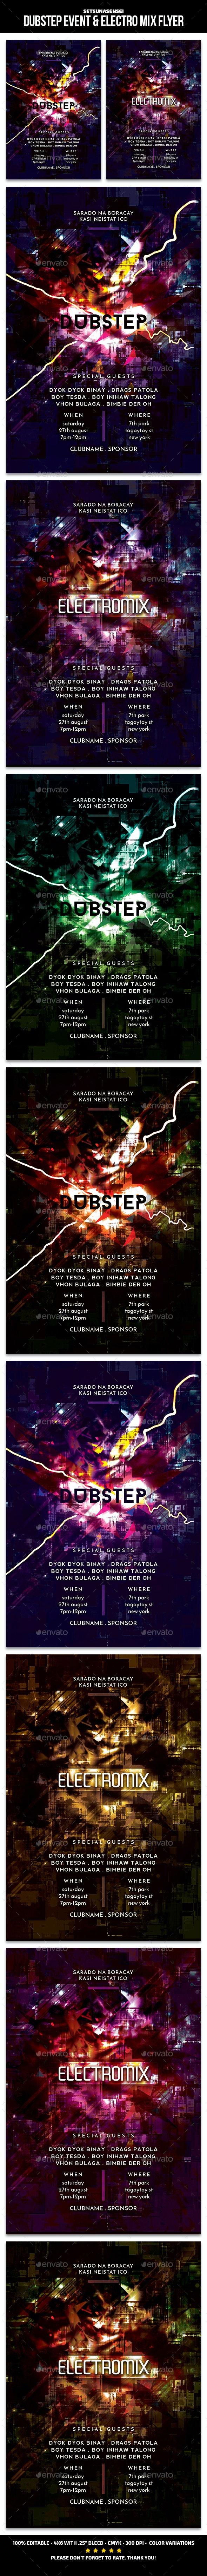 Dubstep Event & Electro Mix Flyer - Events Flyers